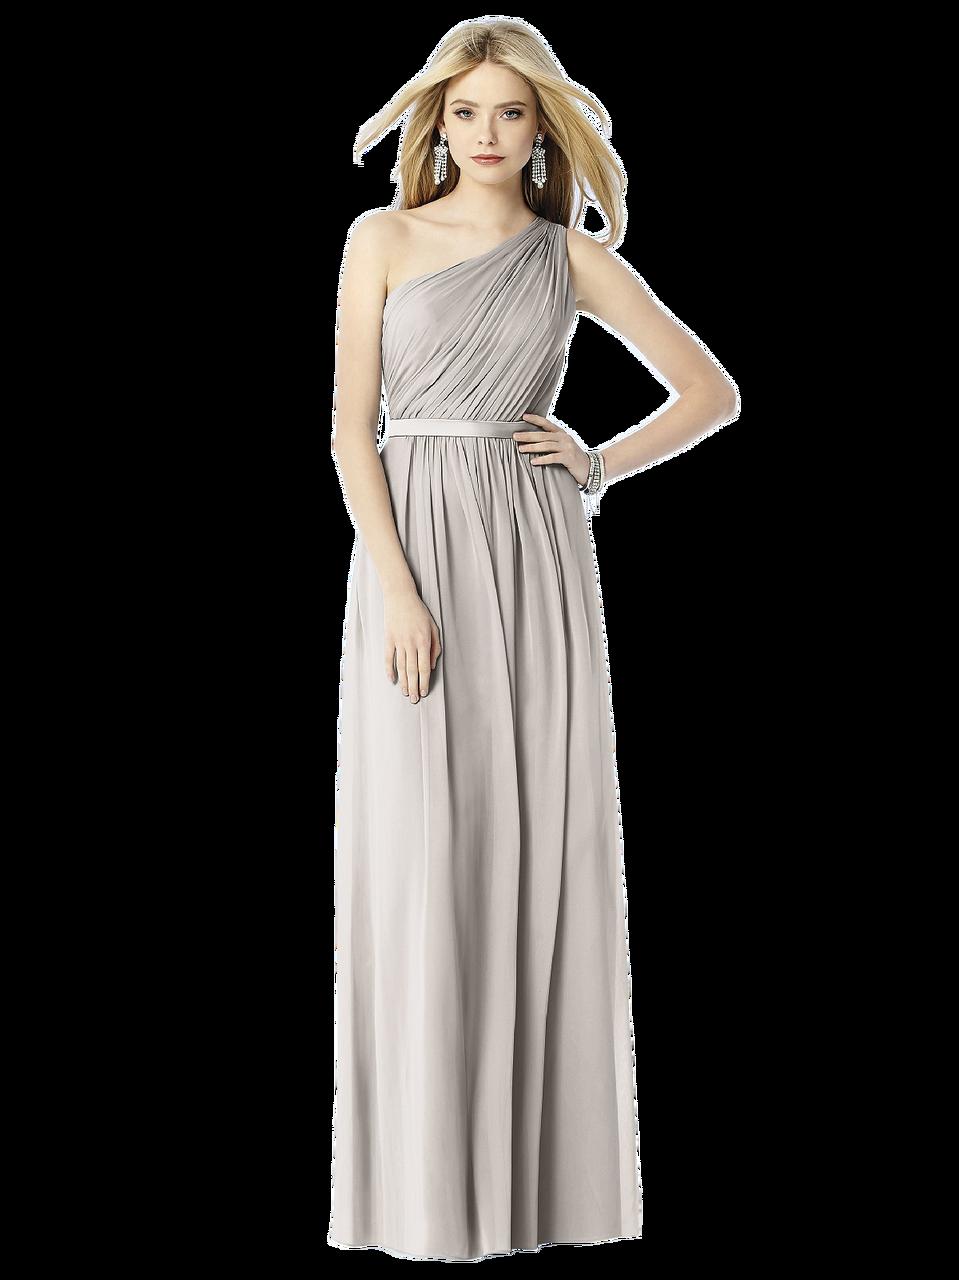 87cc2a323f4 After Six Bridesmaids Style 6706 Fabric: Lux Chiffon Full length one  shoulder lux chiffon dress